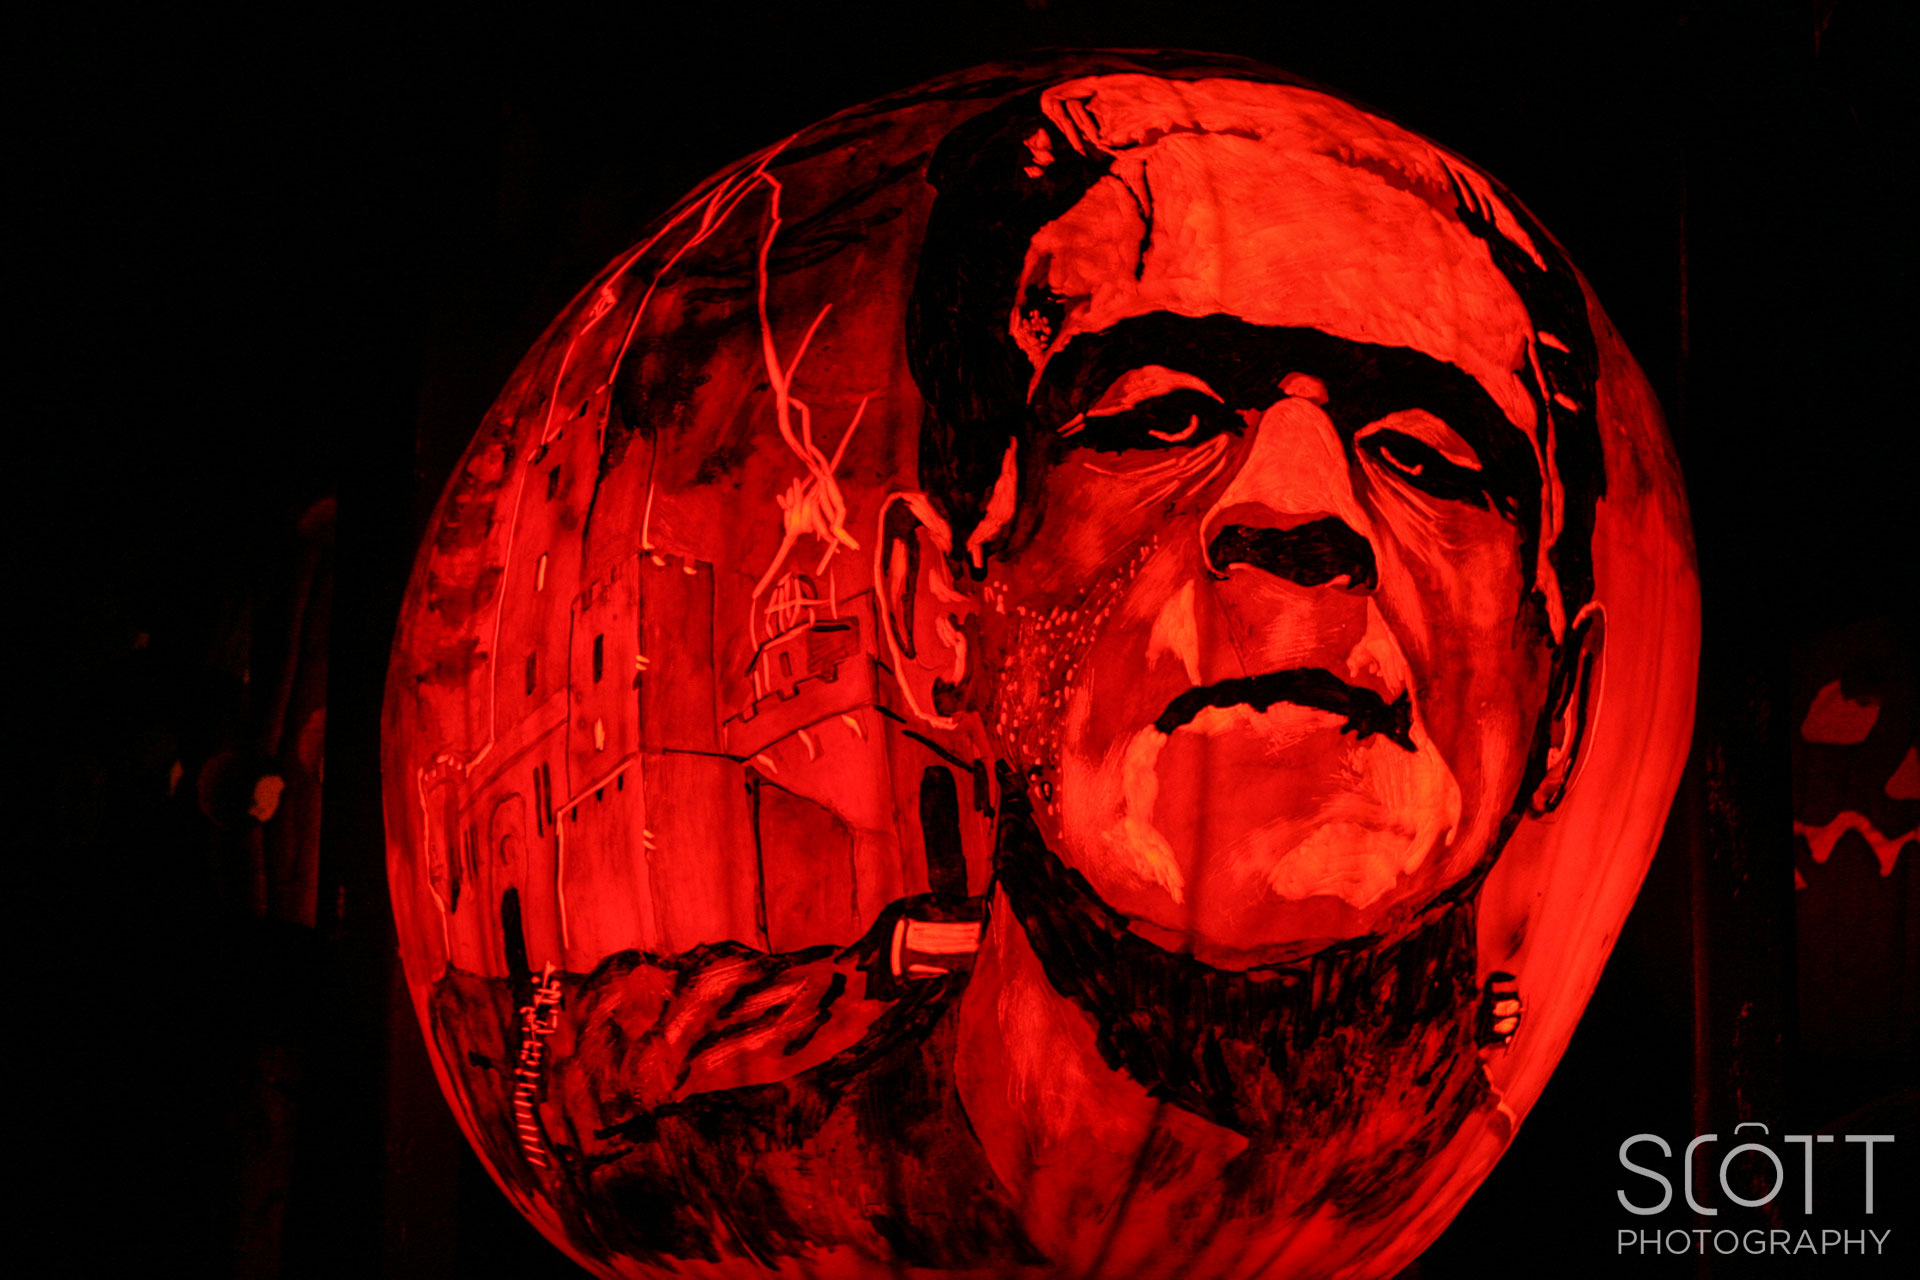 frankenstein-pumpkin-carving-jack-o-lantern-spectacular-2014 - scott